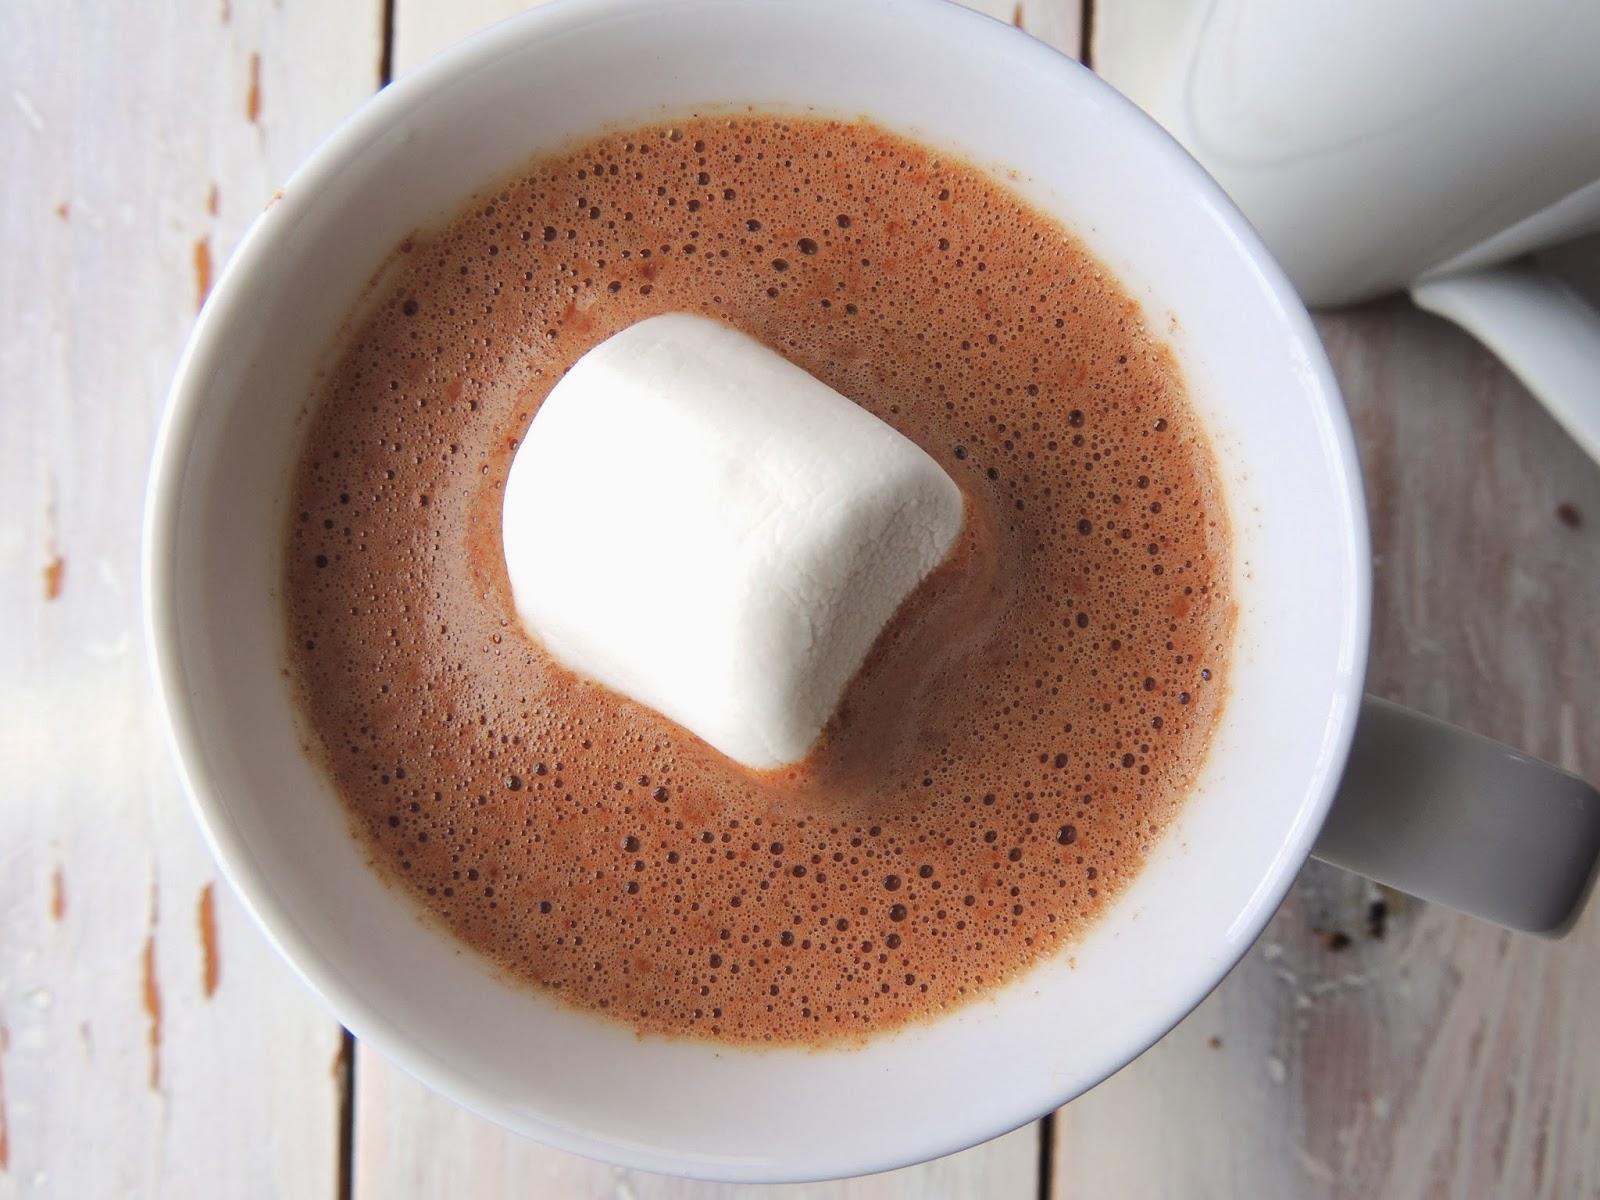 Hot Chocolate Makes Heart